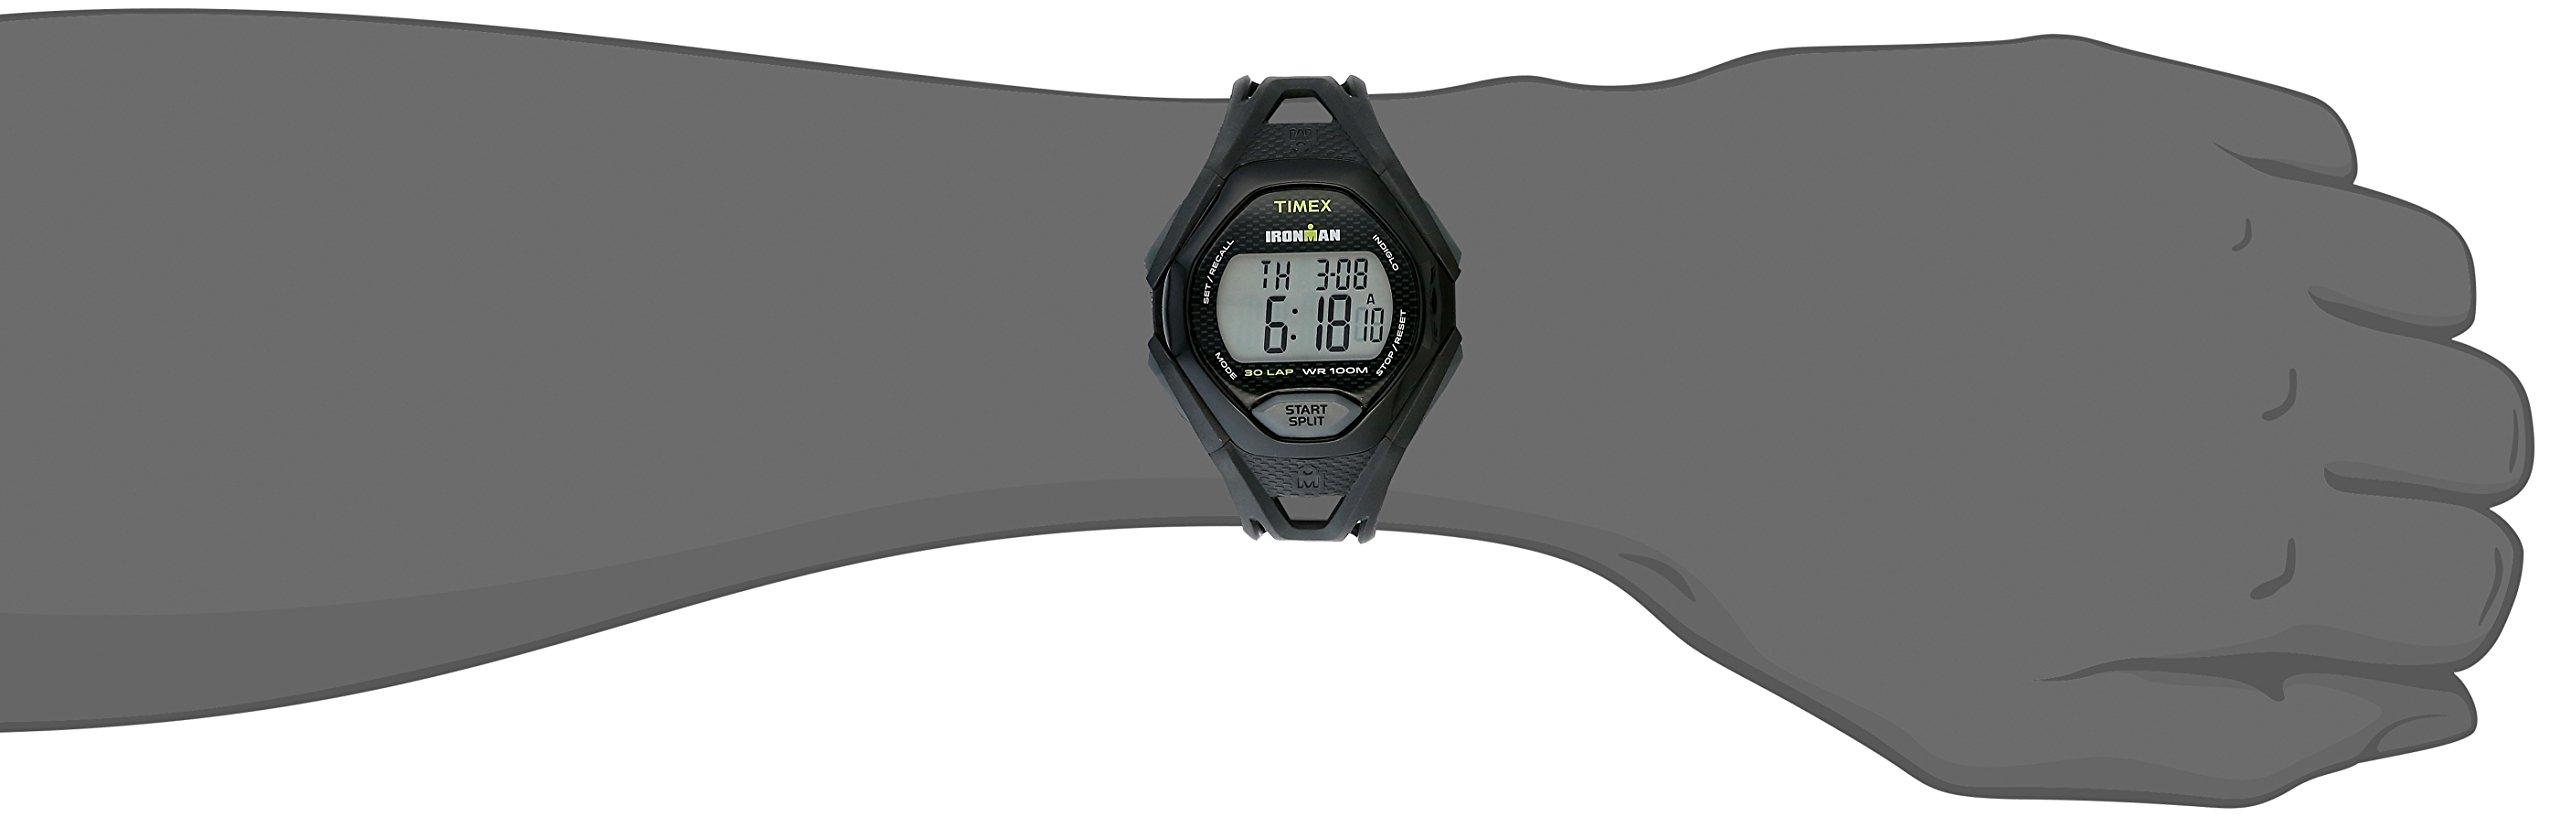 Timex Men's TW5M10400 Ironman Sleek 30 Black Resin Strap Watch by Timex (Image #4)